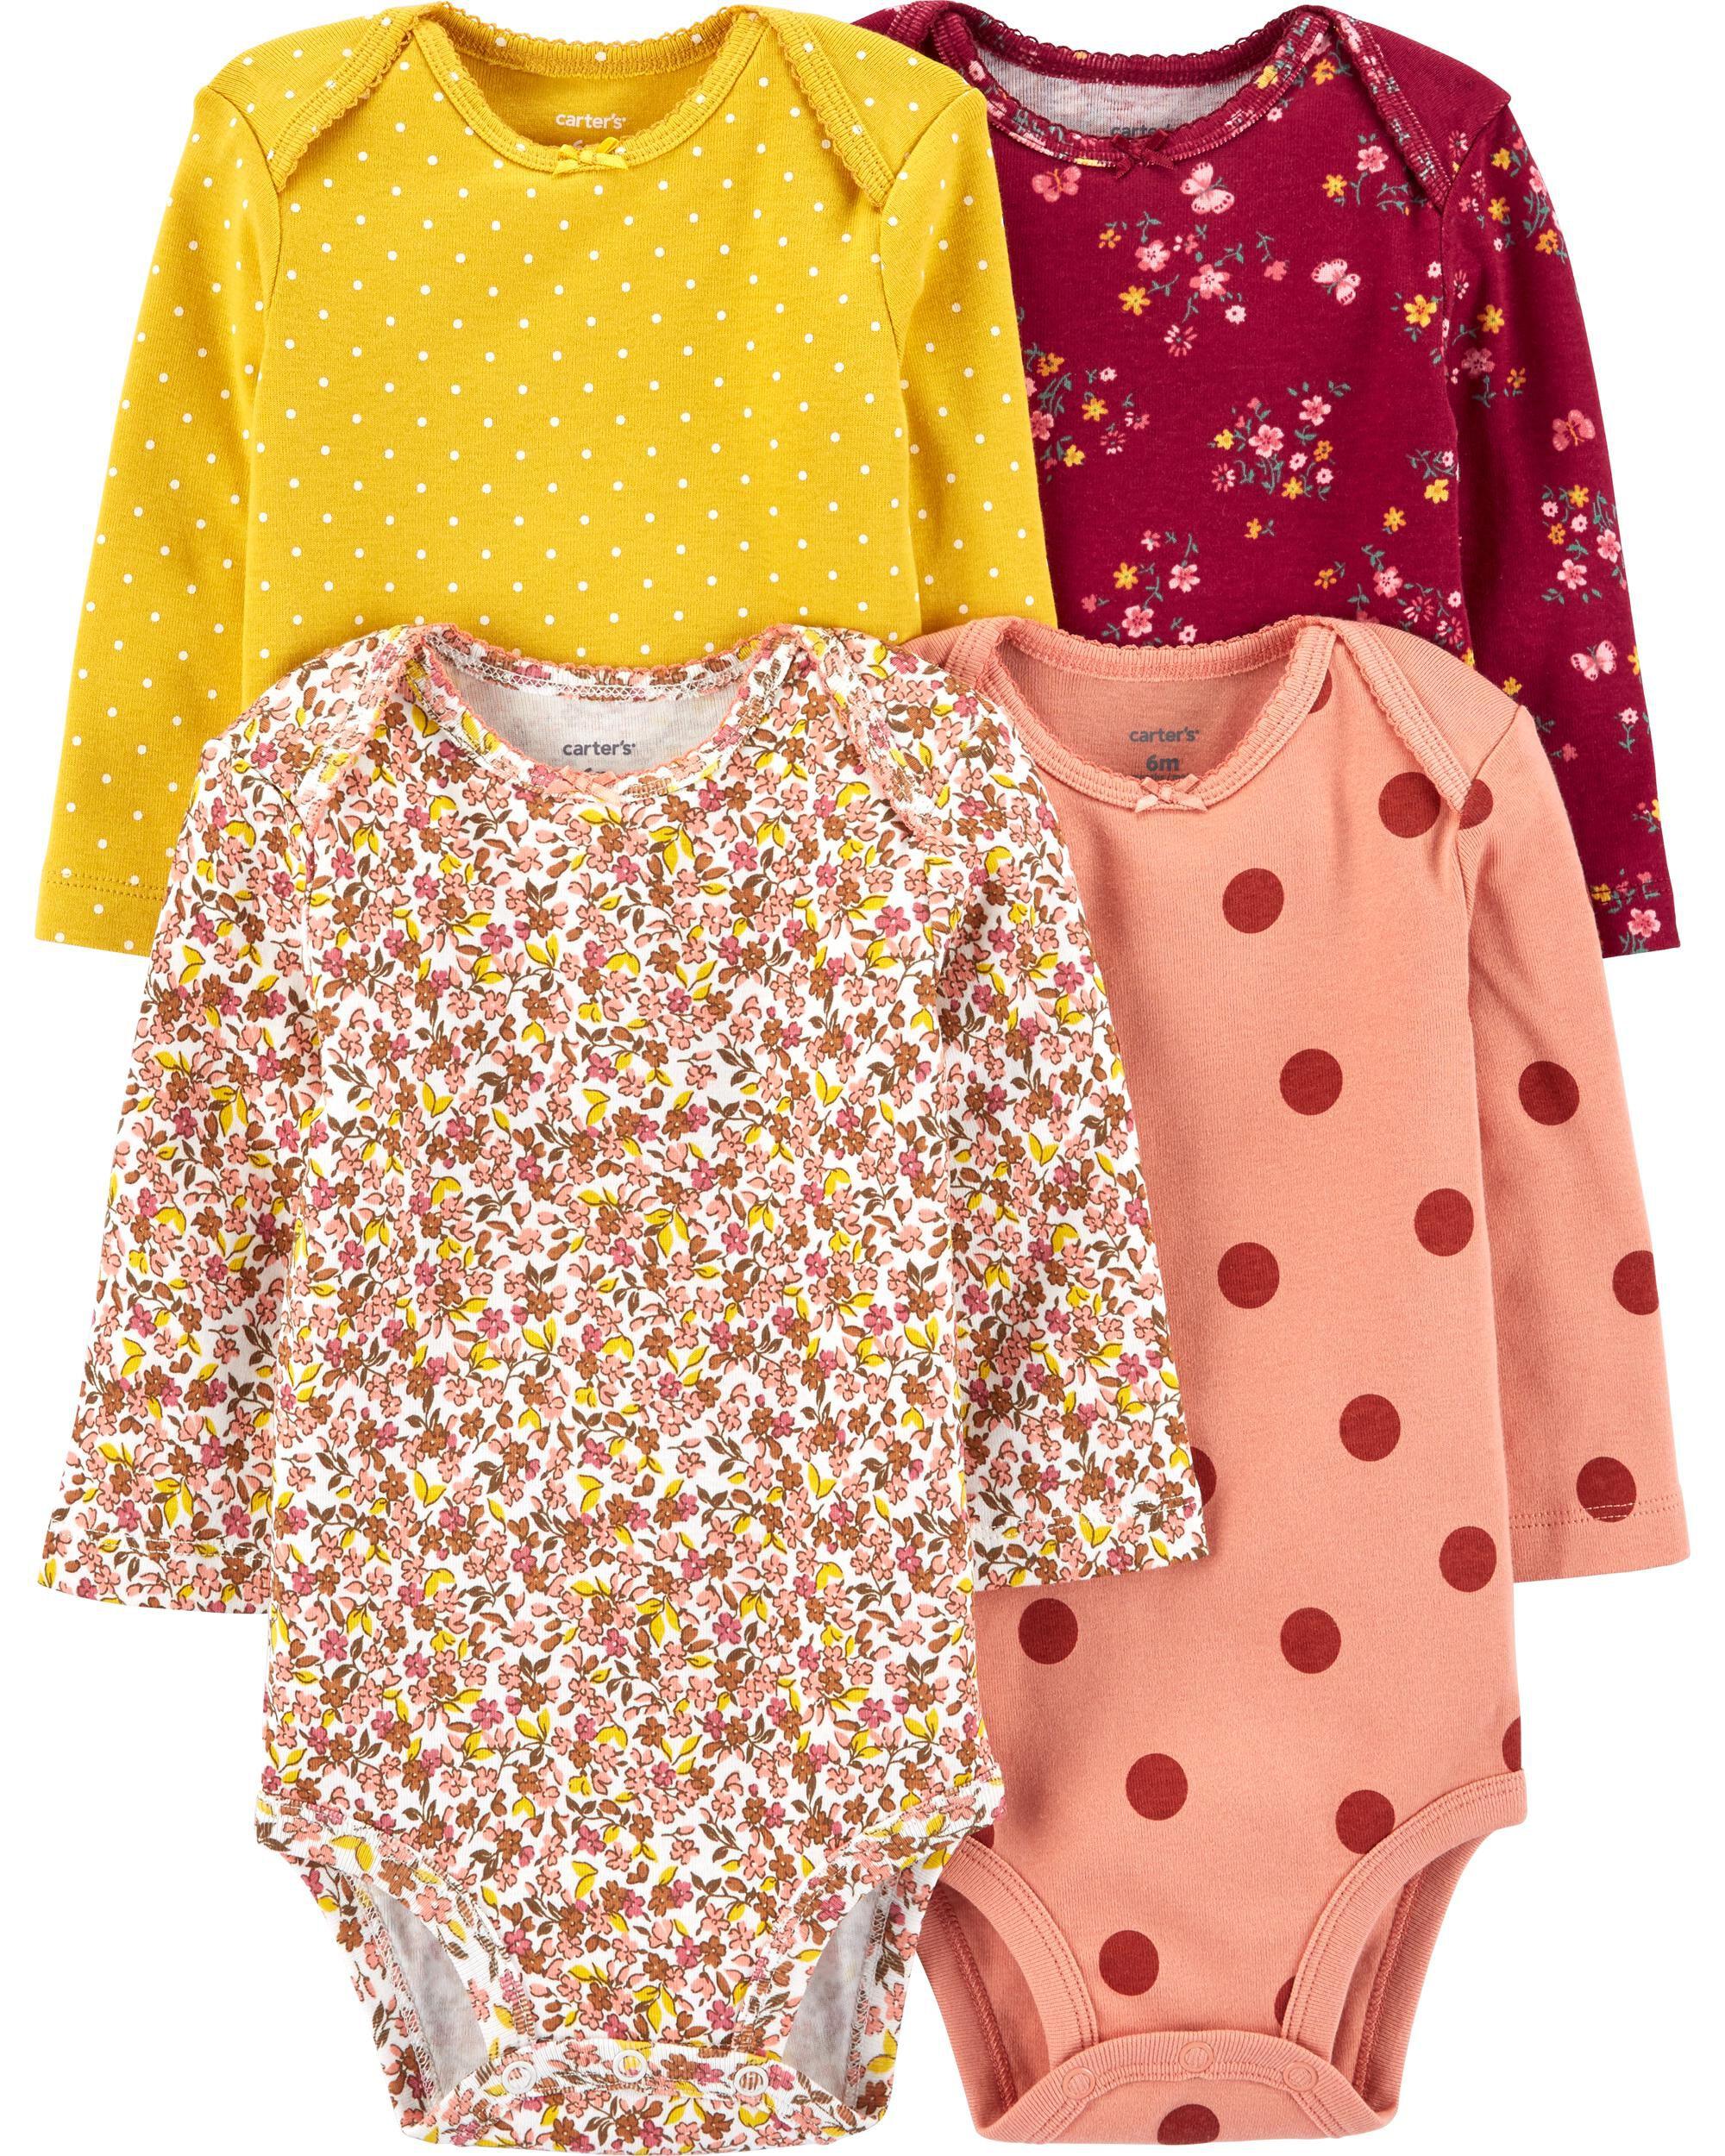 4-Pack Floral Original Bodysuits